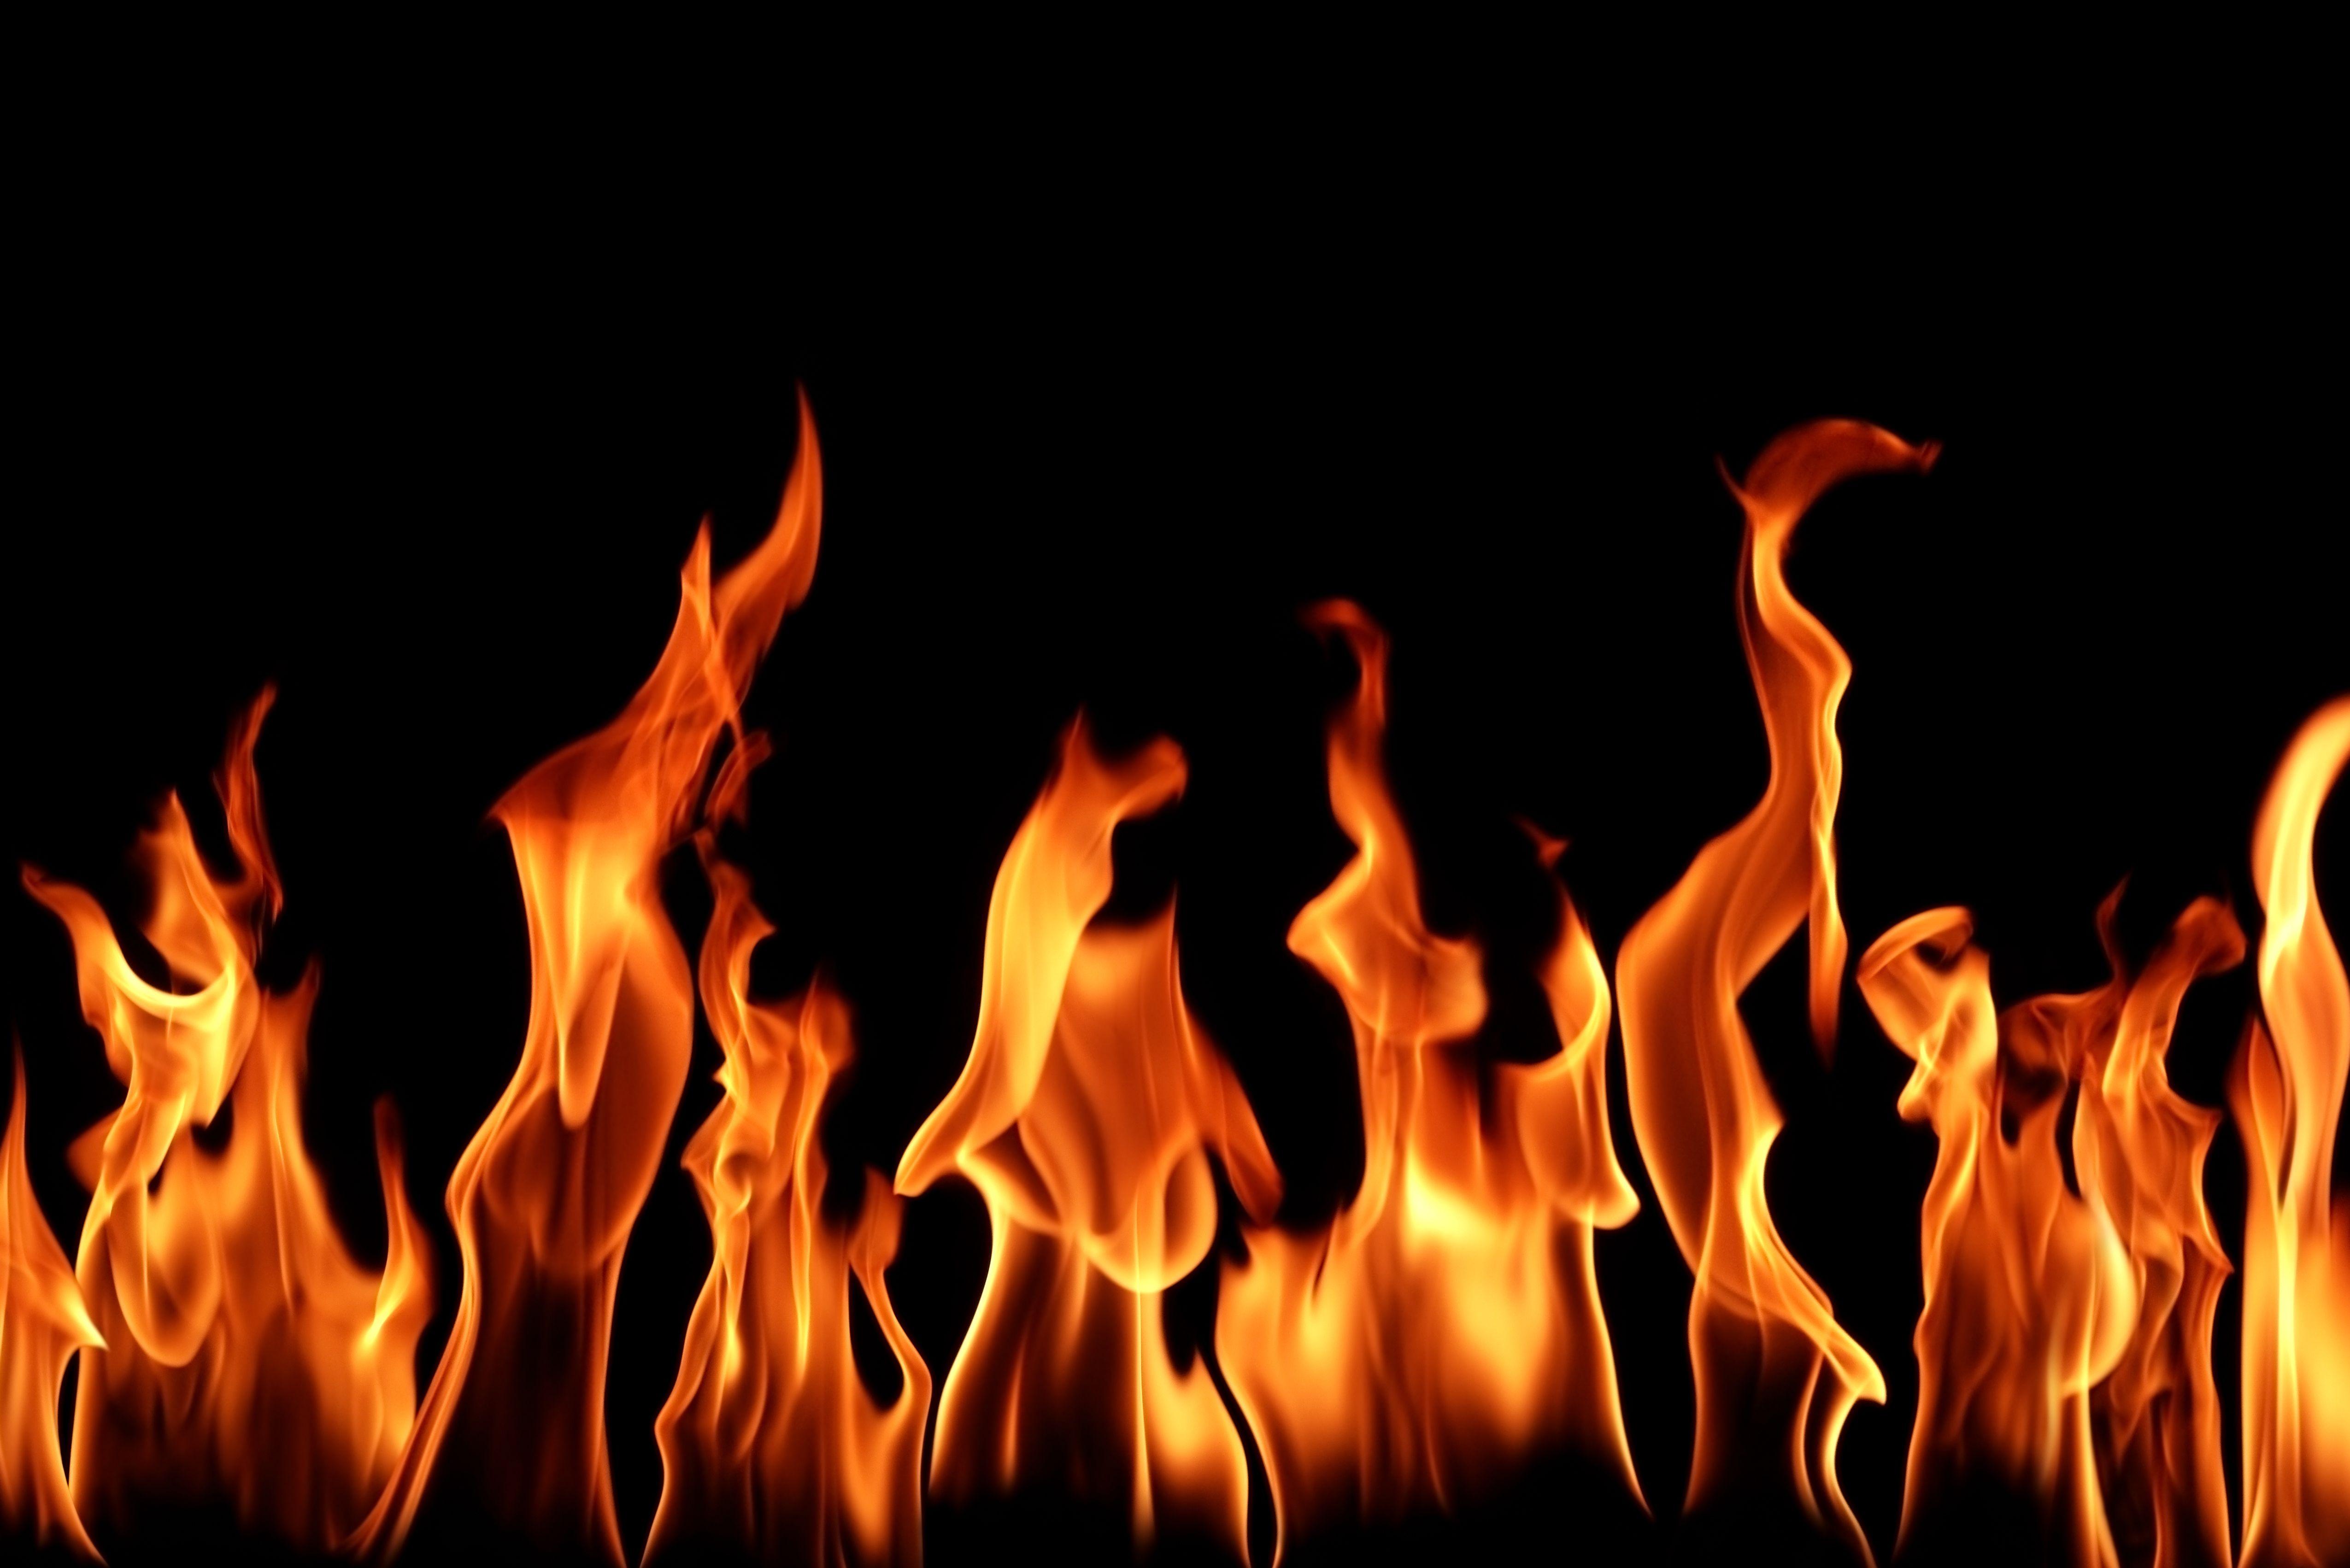 Flame clipart fire wallpaper. Flames x